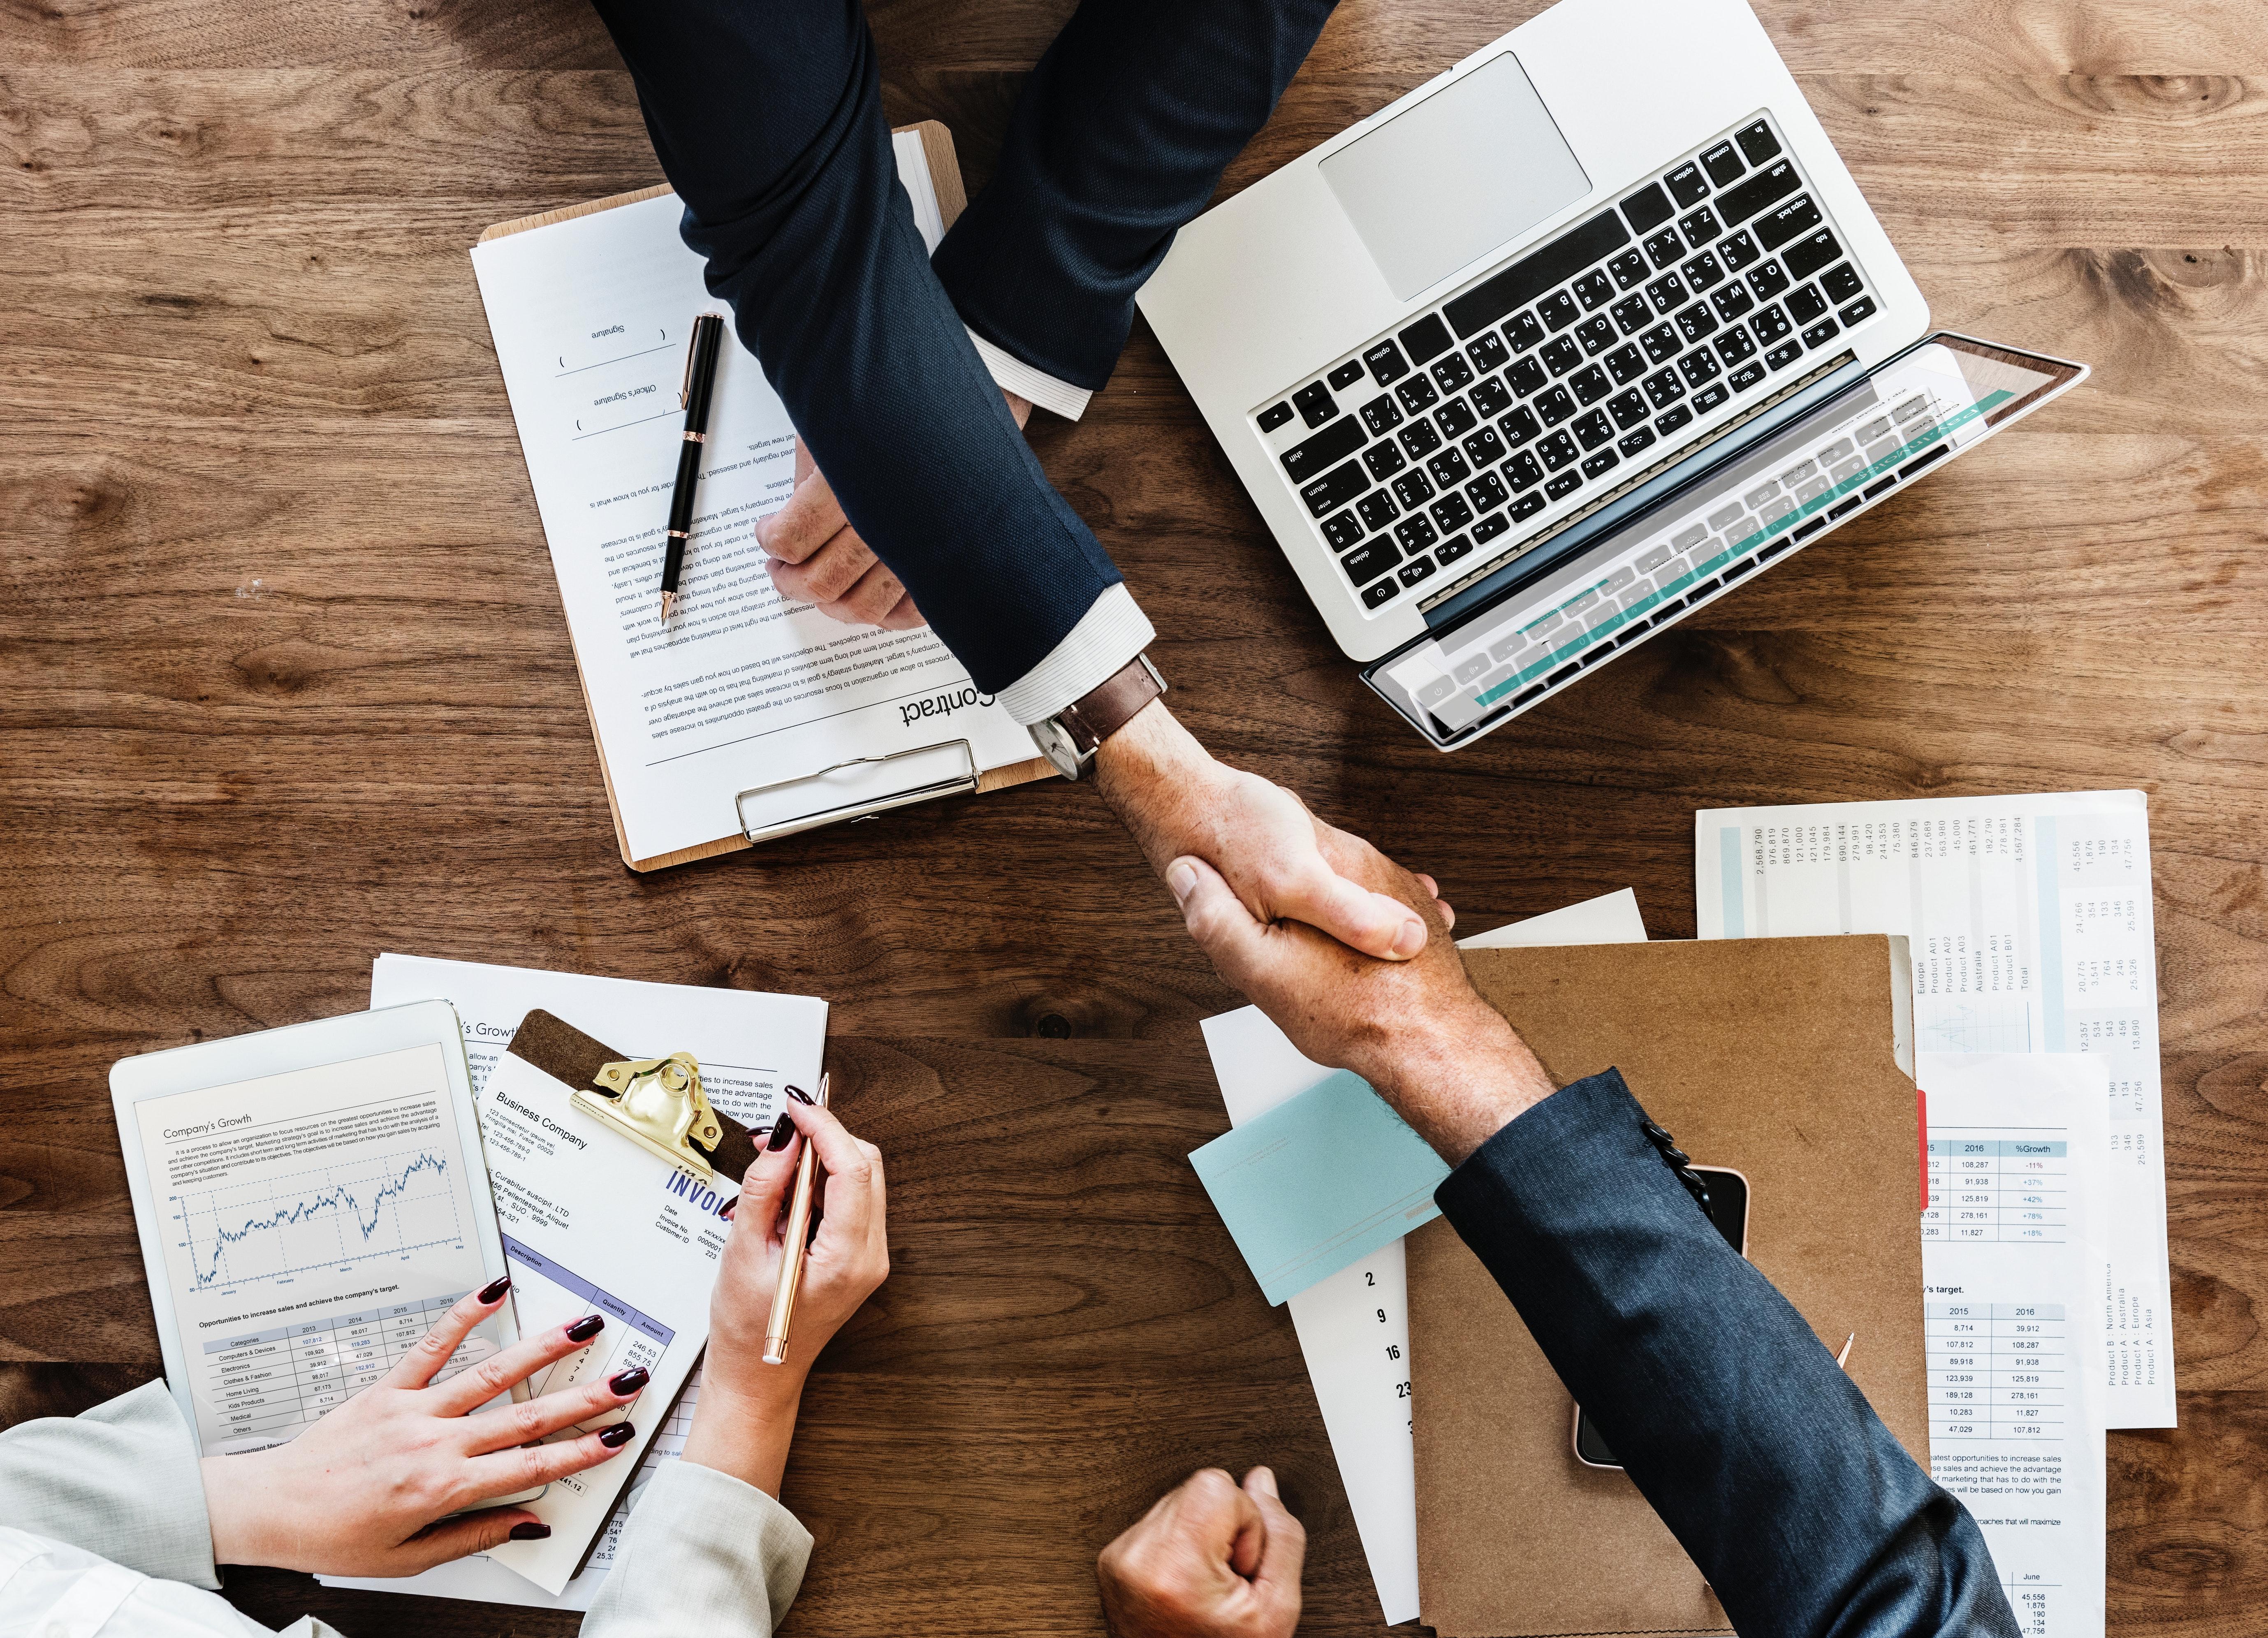 mercure-asesoramiento-asesoria-legal-negocio-abogado-abogados-economista-economistas